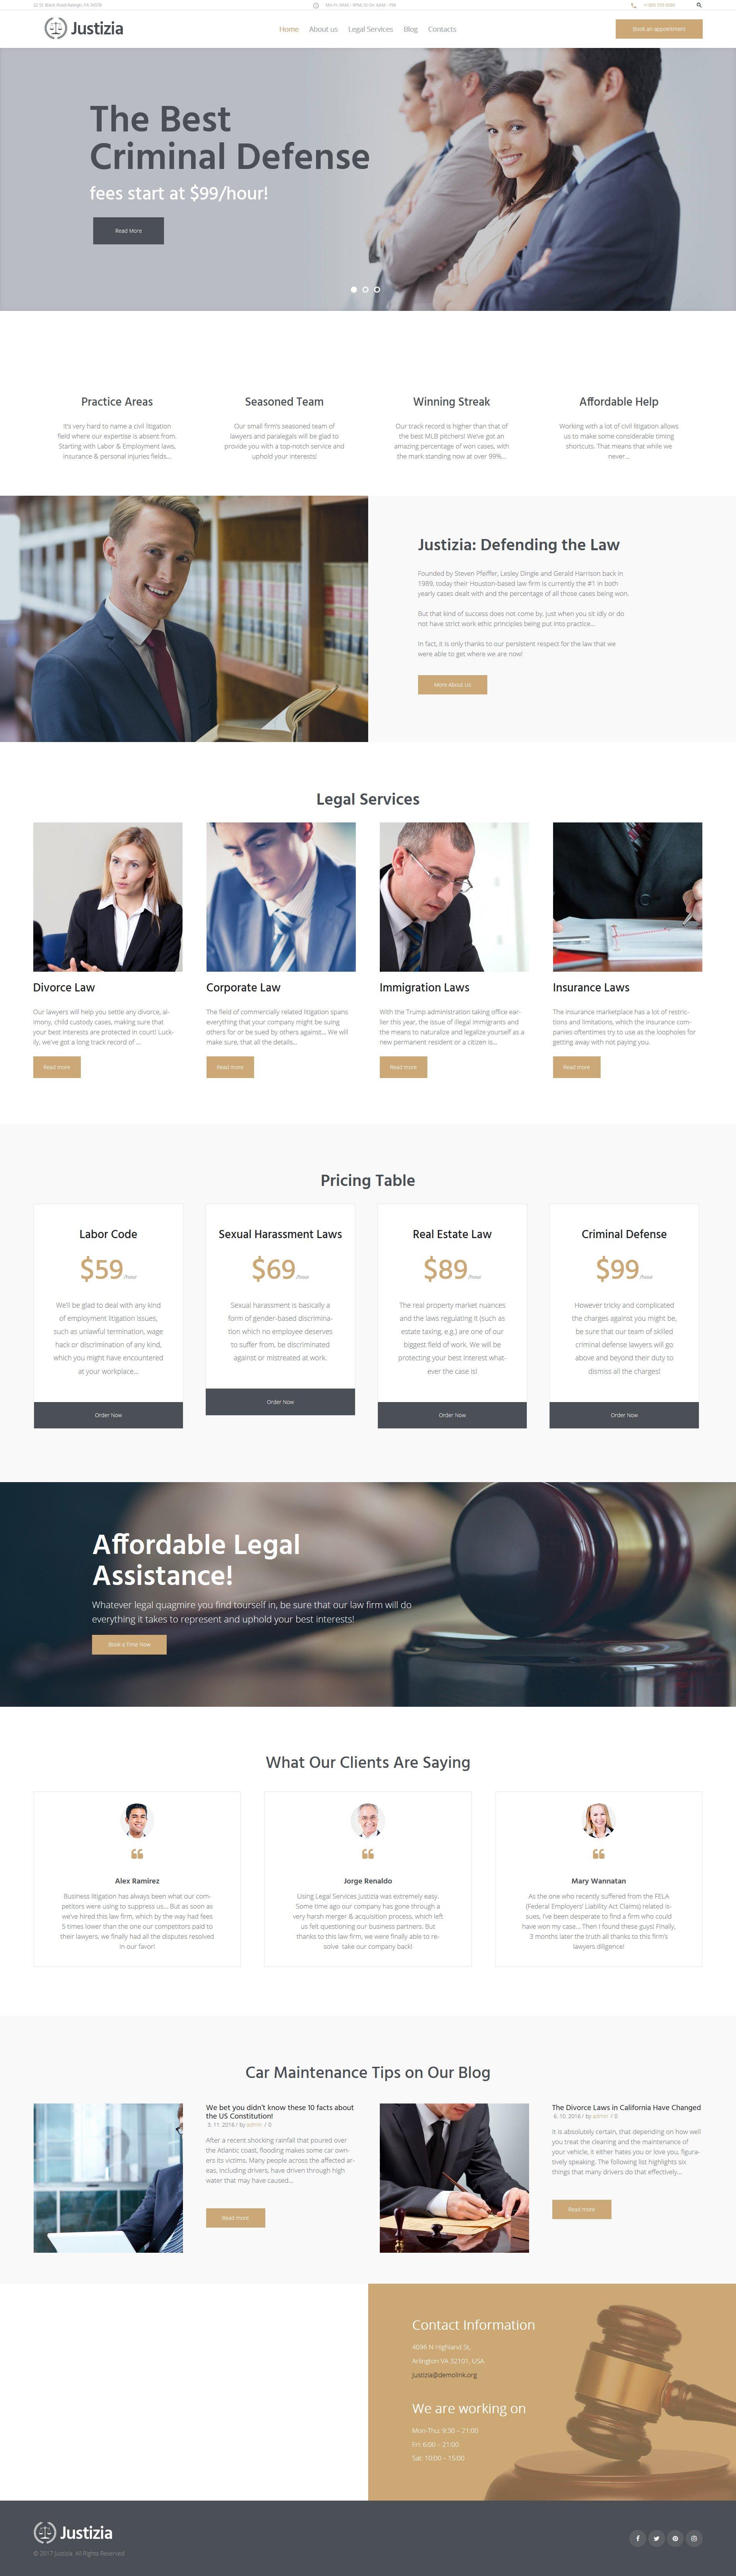 Justizia - Lawyer Services Responsive Tema WordPress №62440 - captura de tela